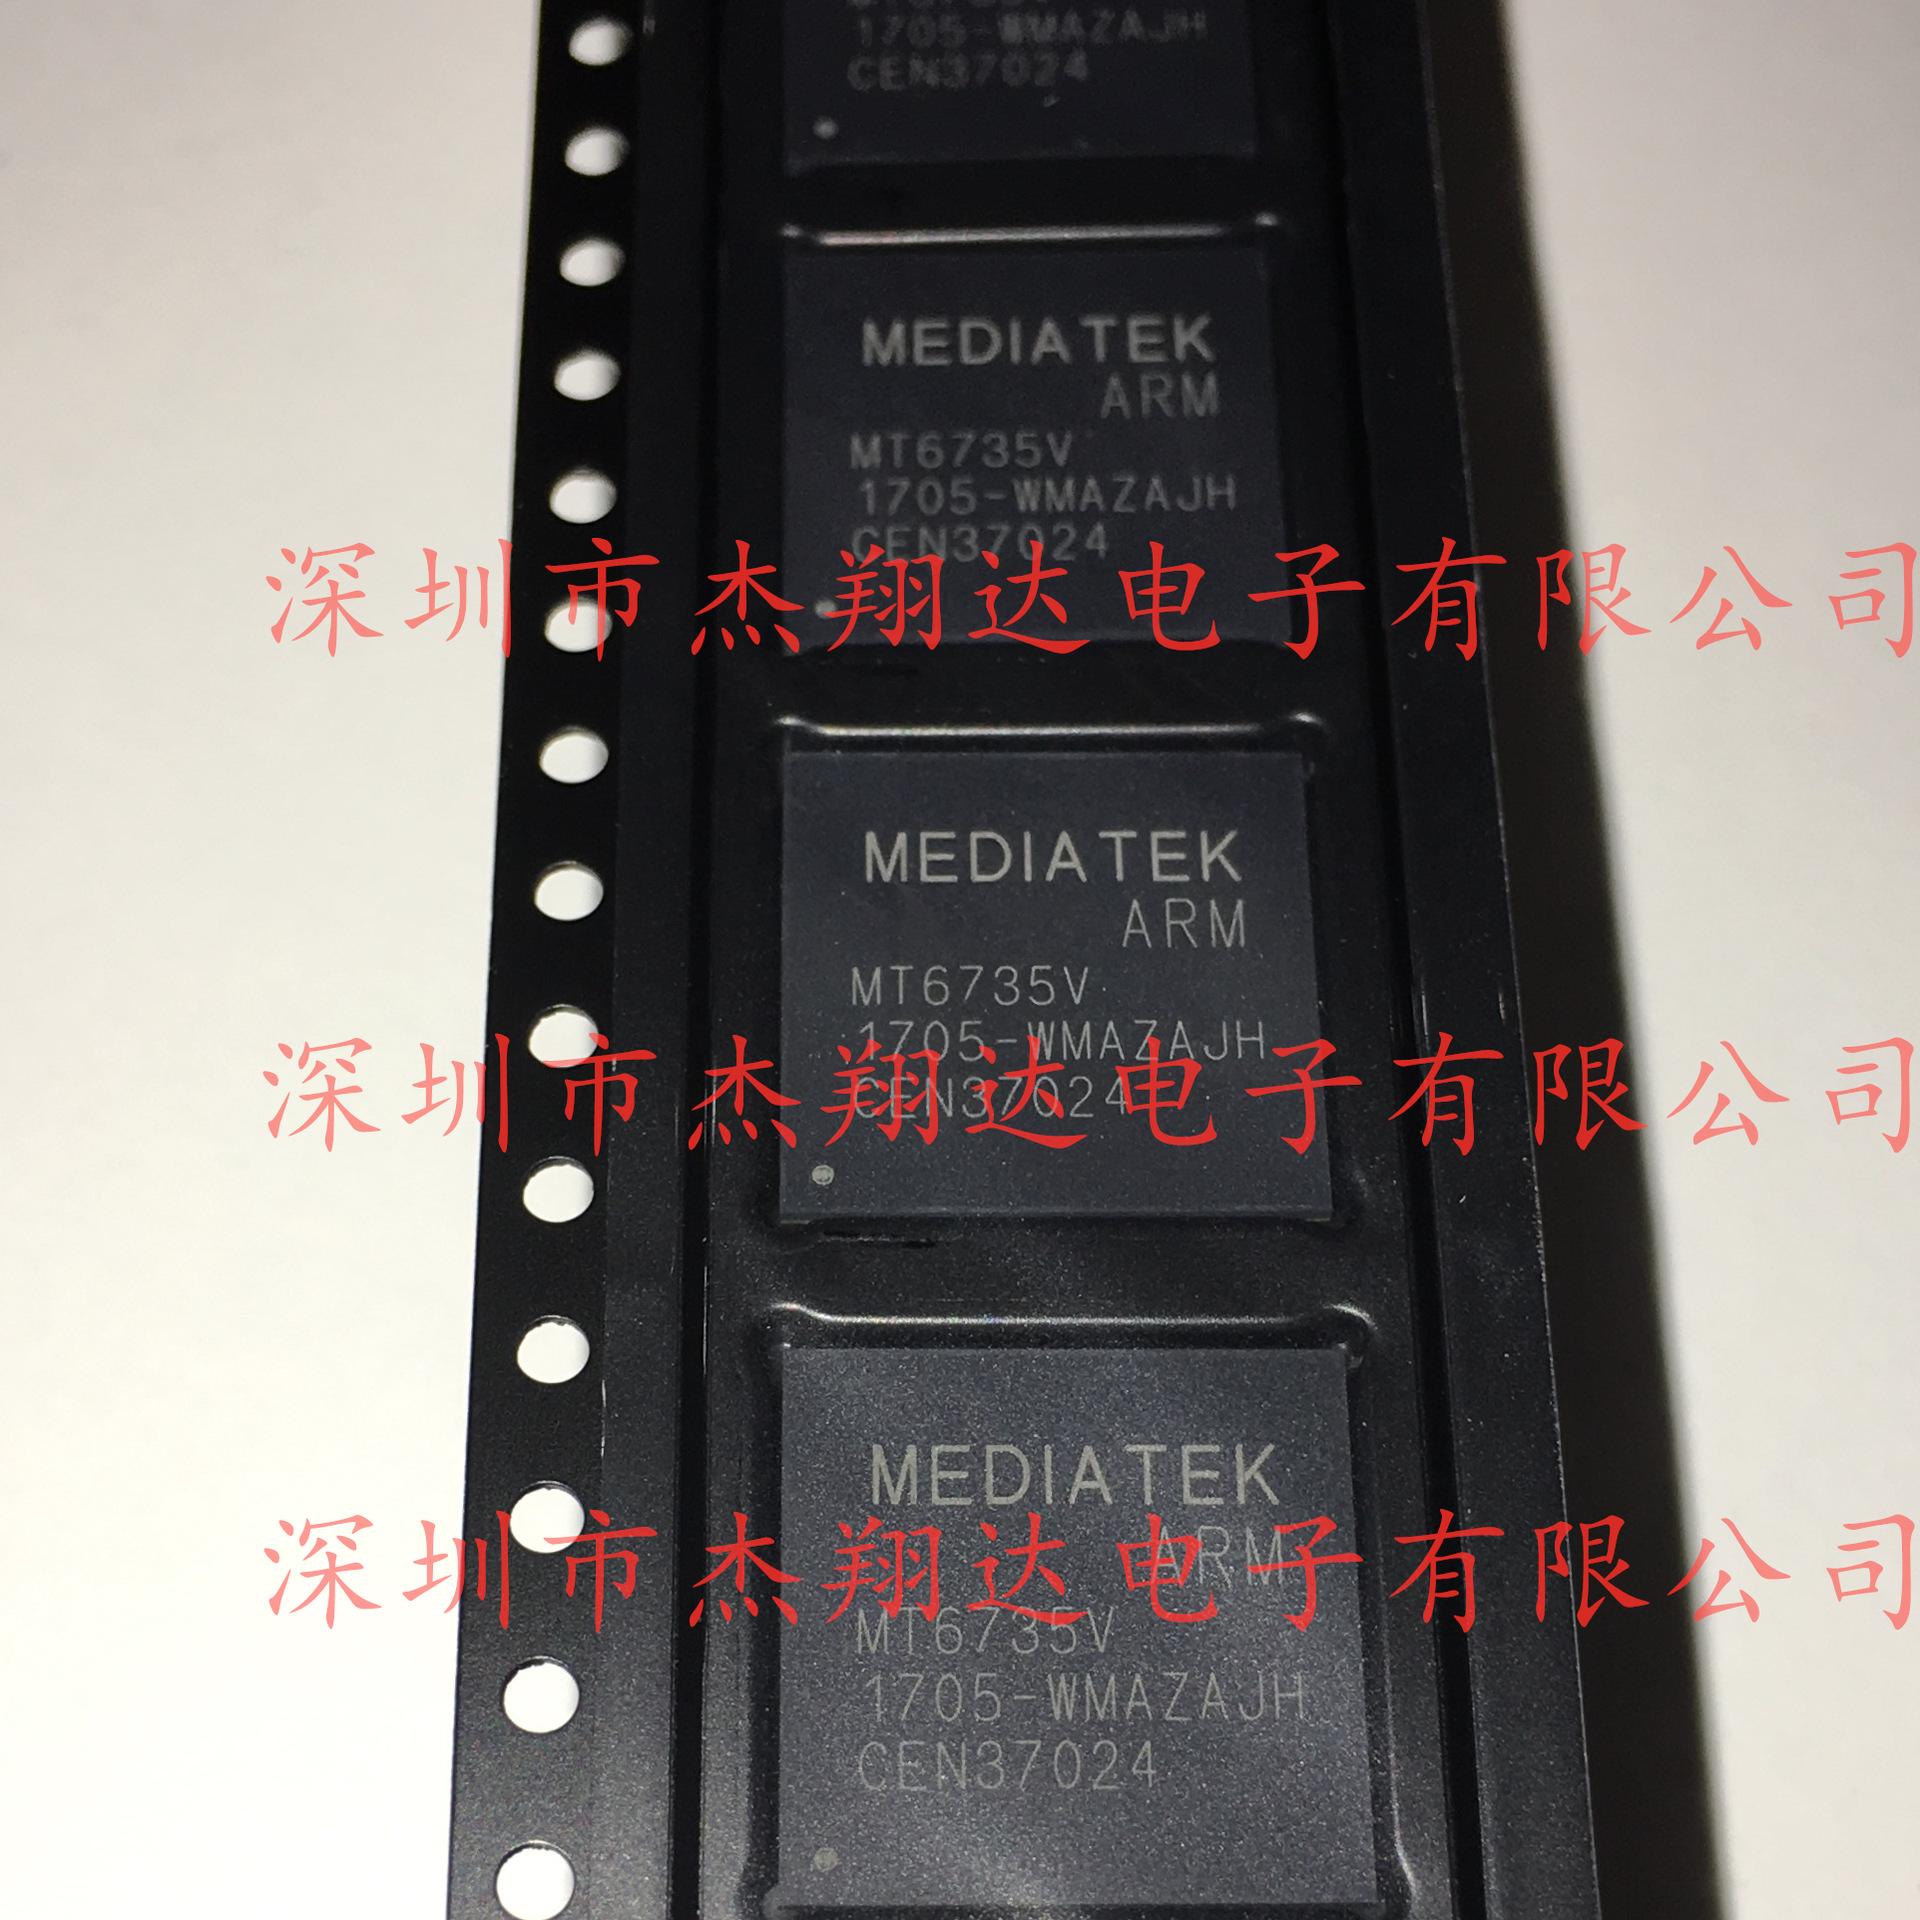 MT6735V MT6735V/WMA MTK 原装现货 价格请咨询为准 也回收